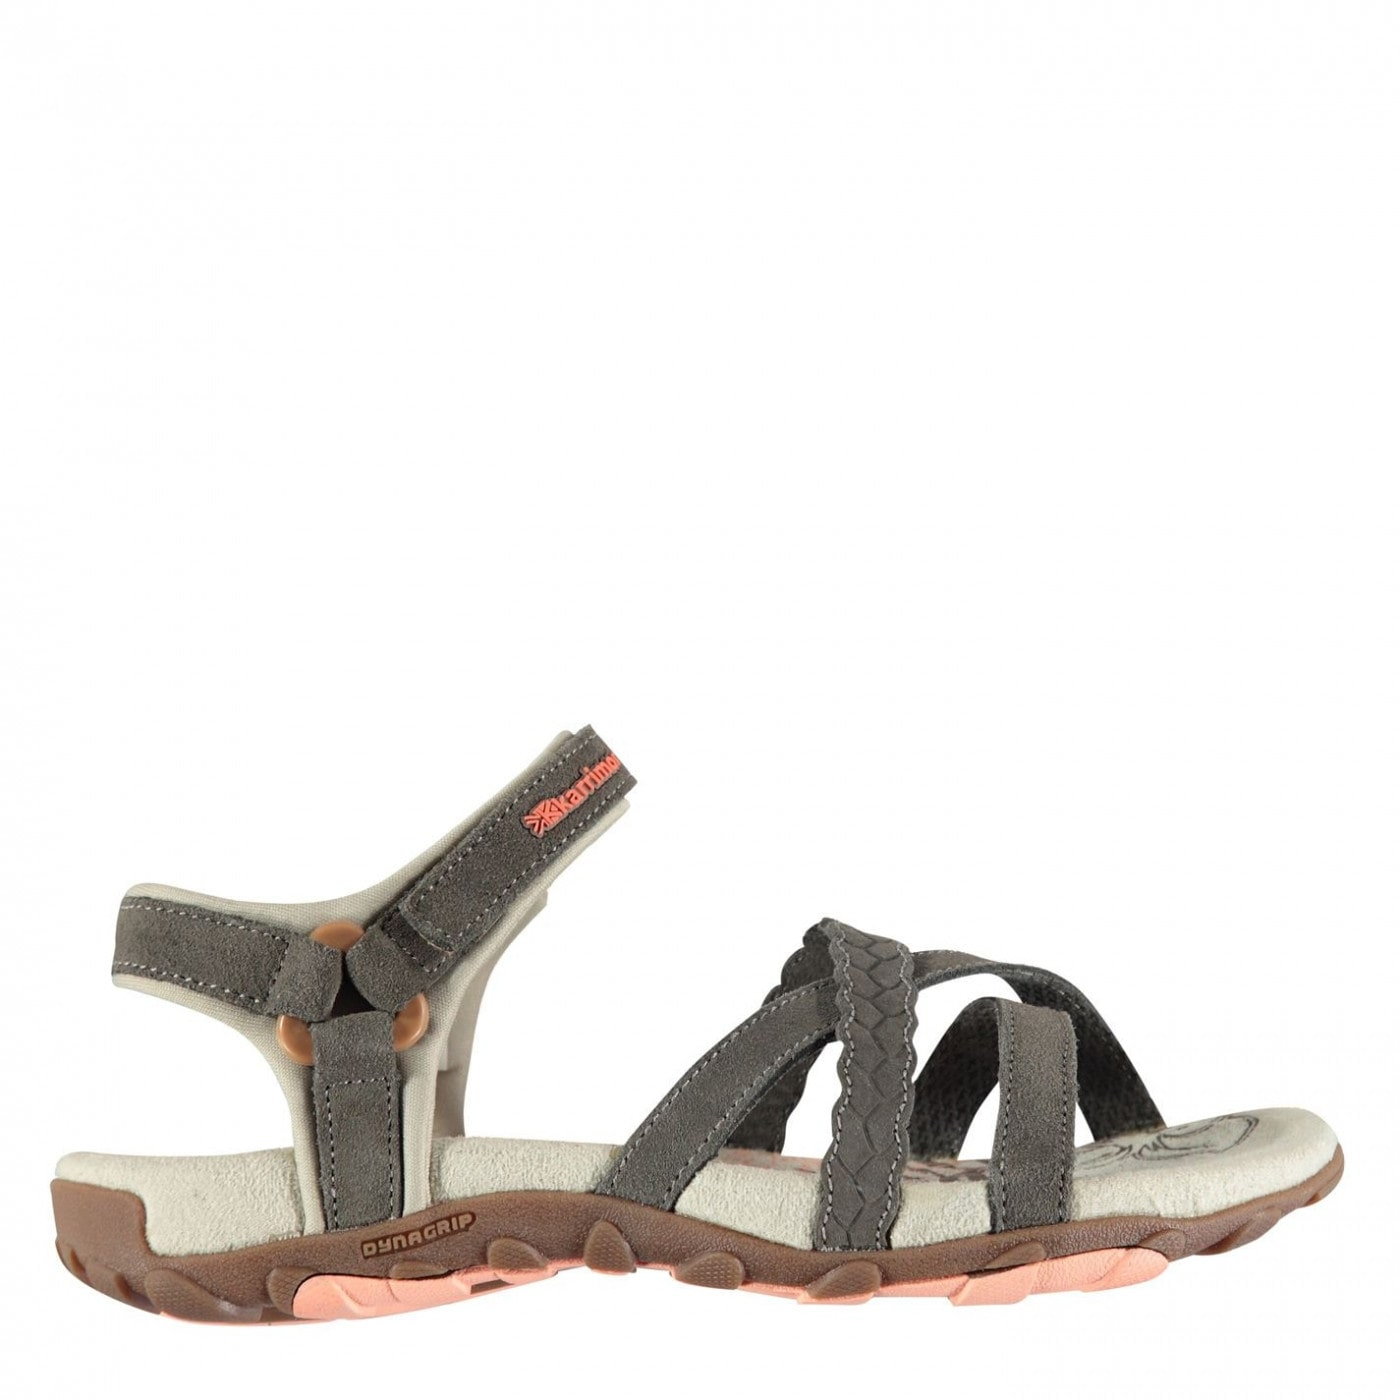 Women's sandals Karrimor Salina Leather